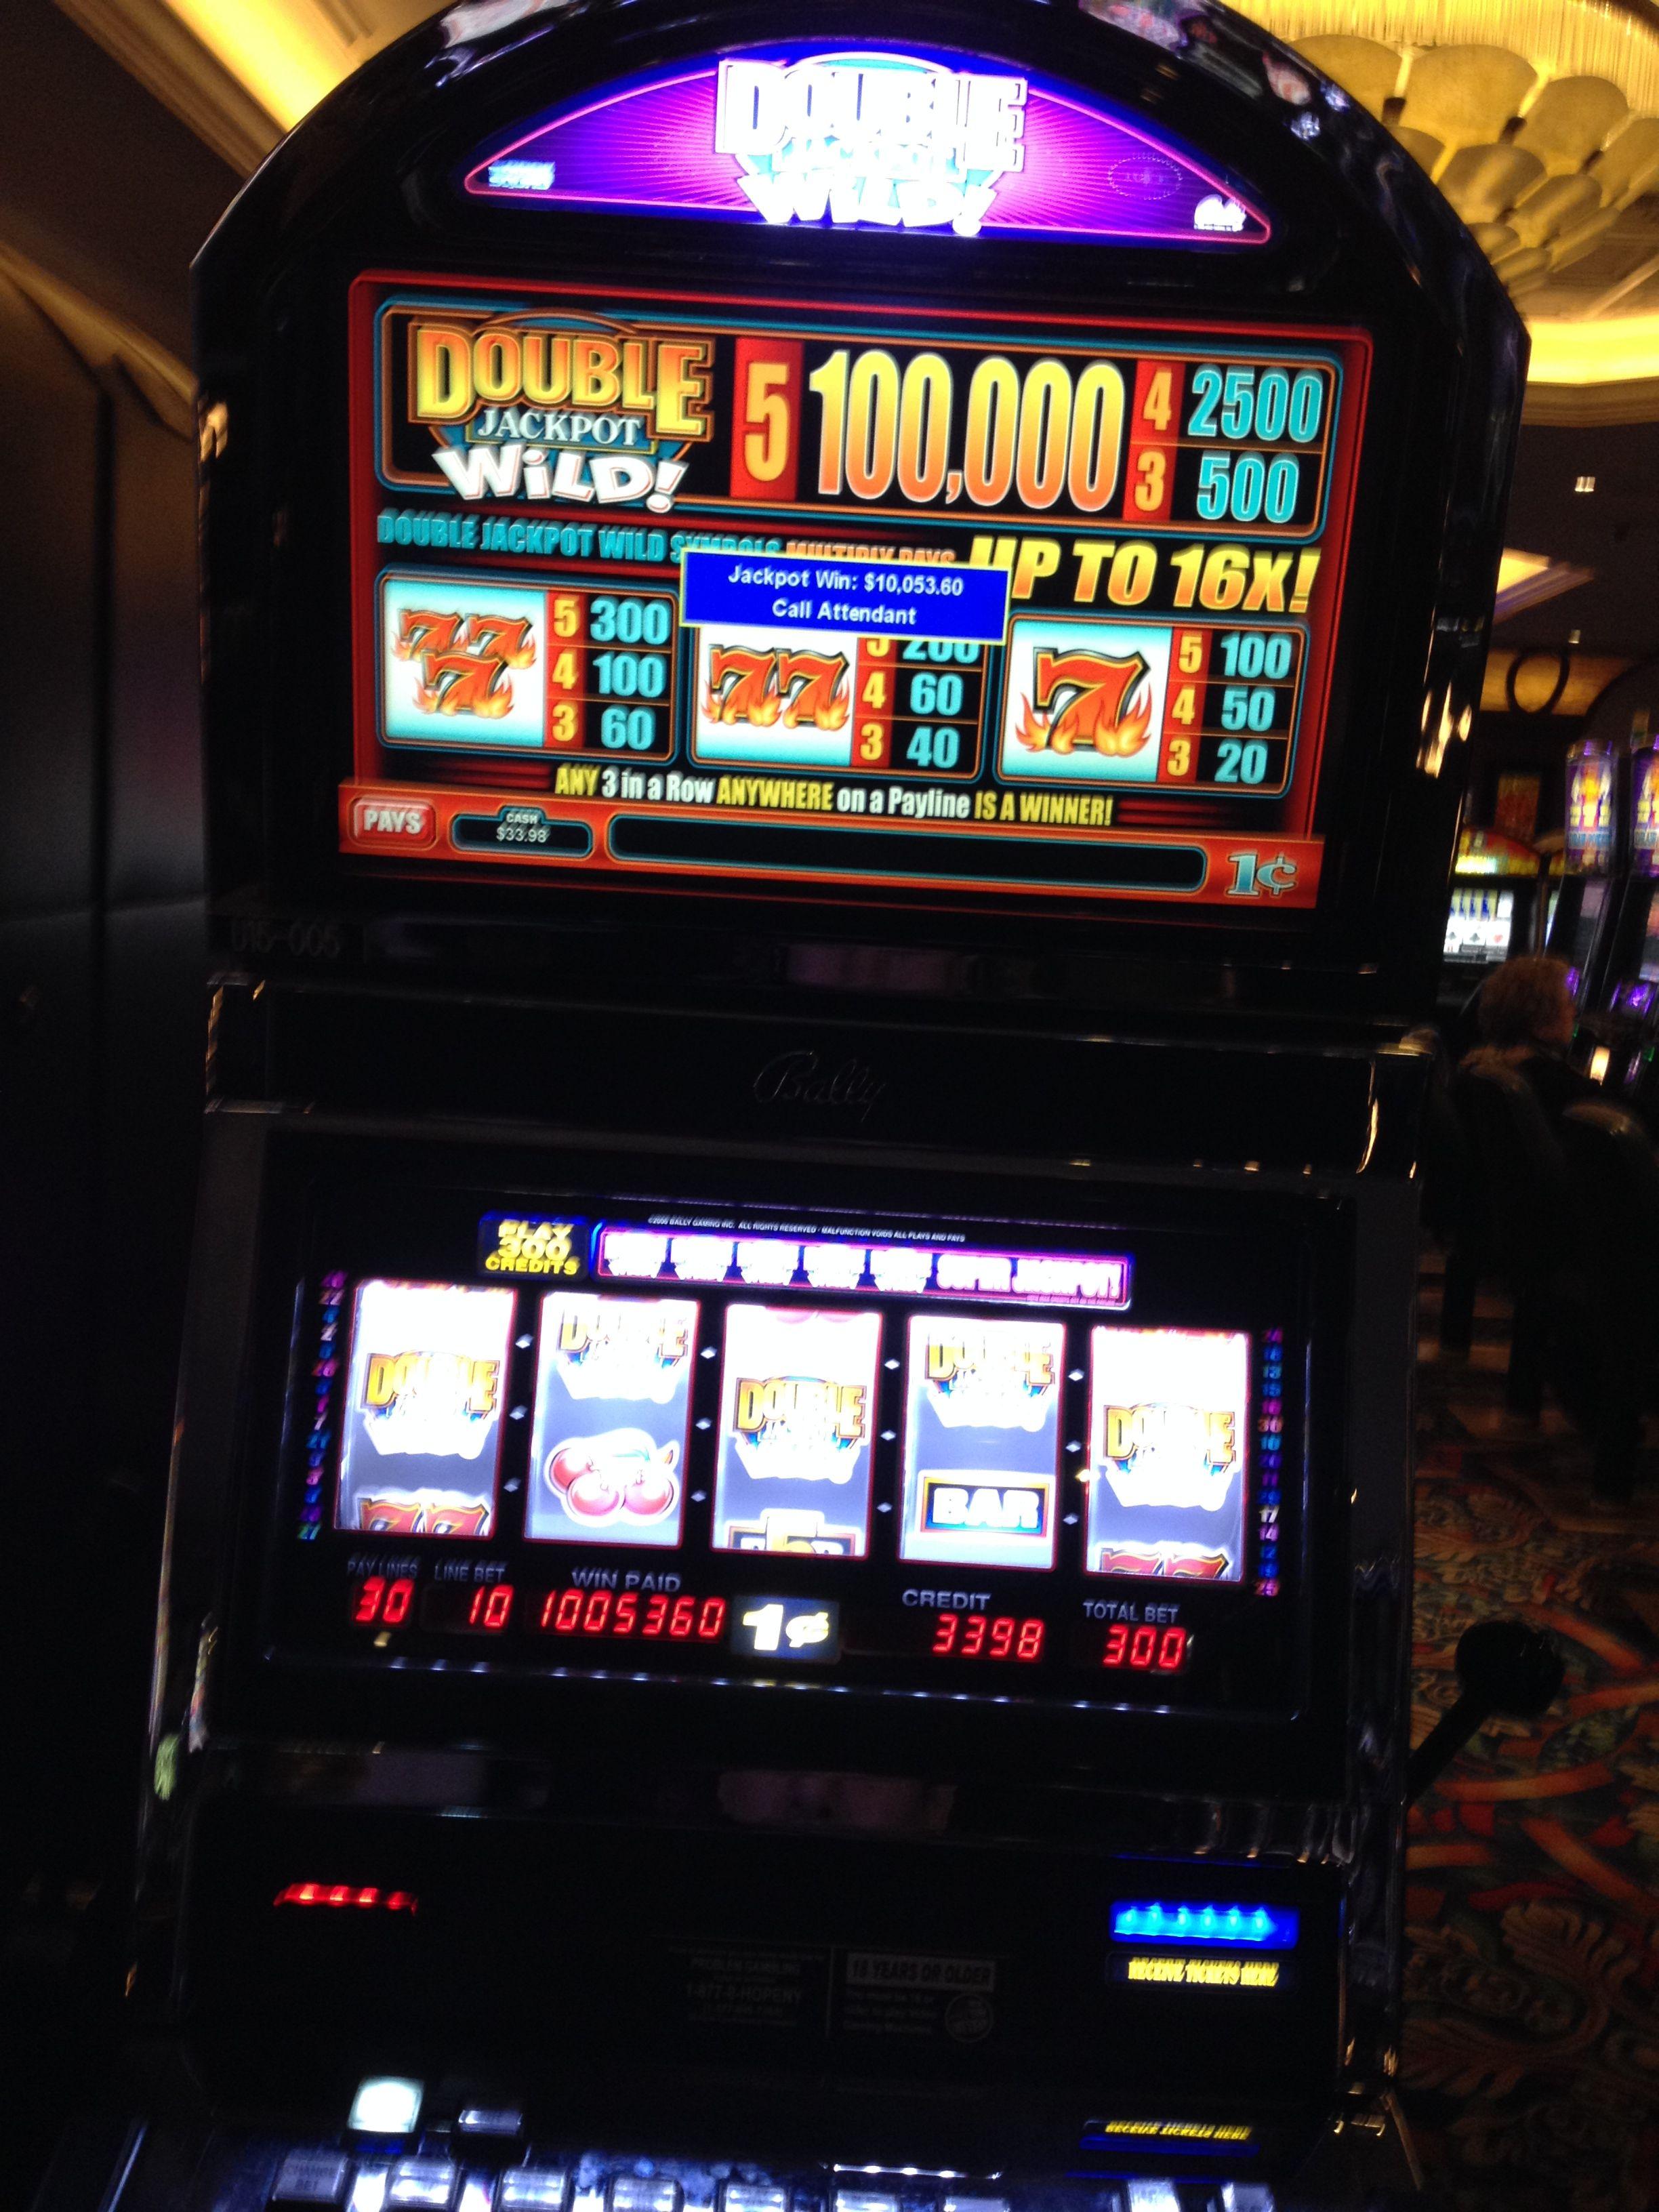 Empire poker casino ant war 2 game